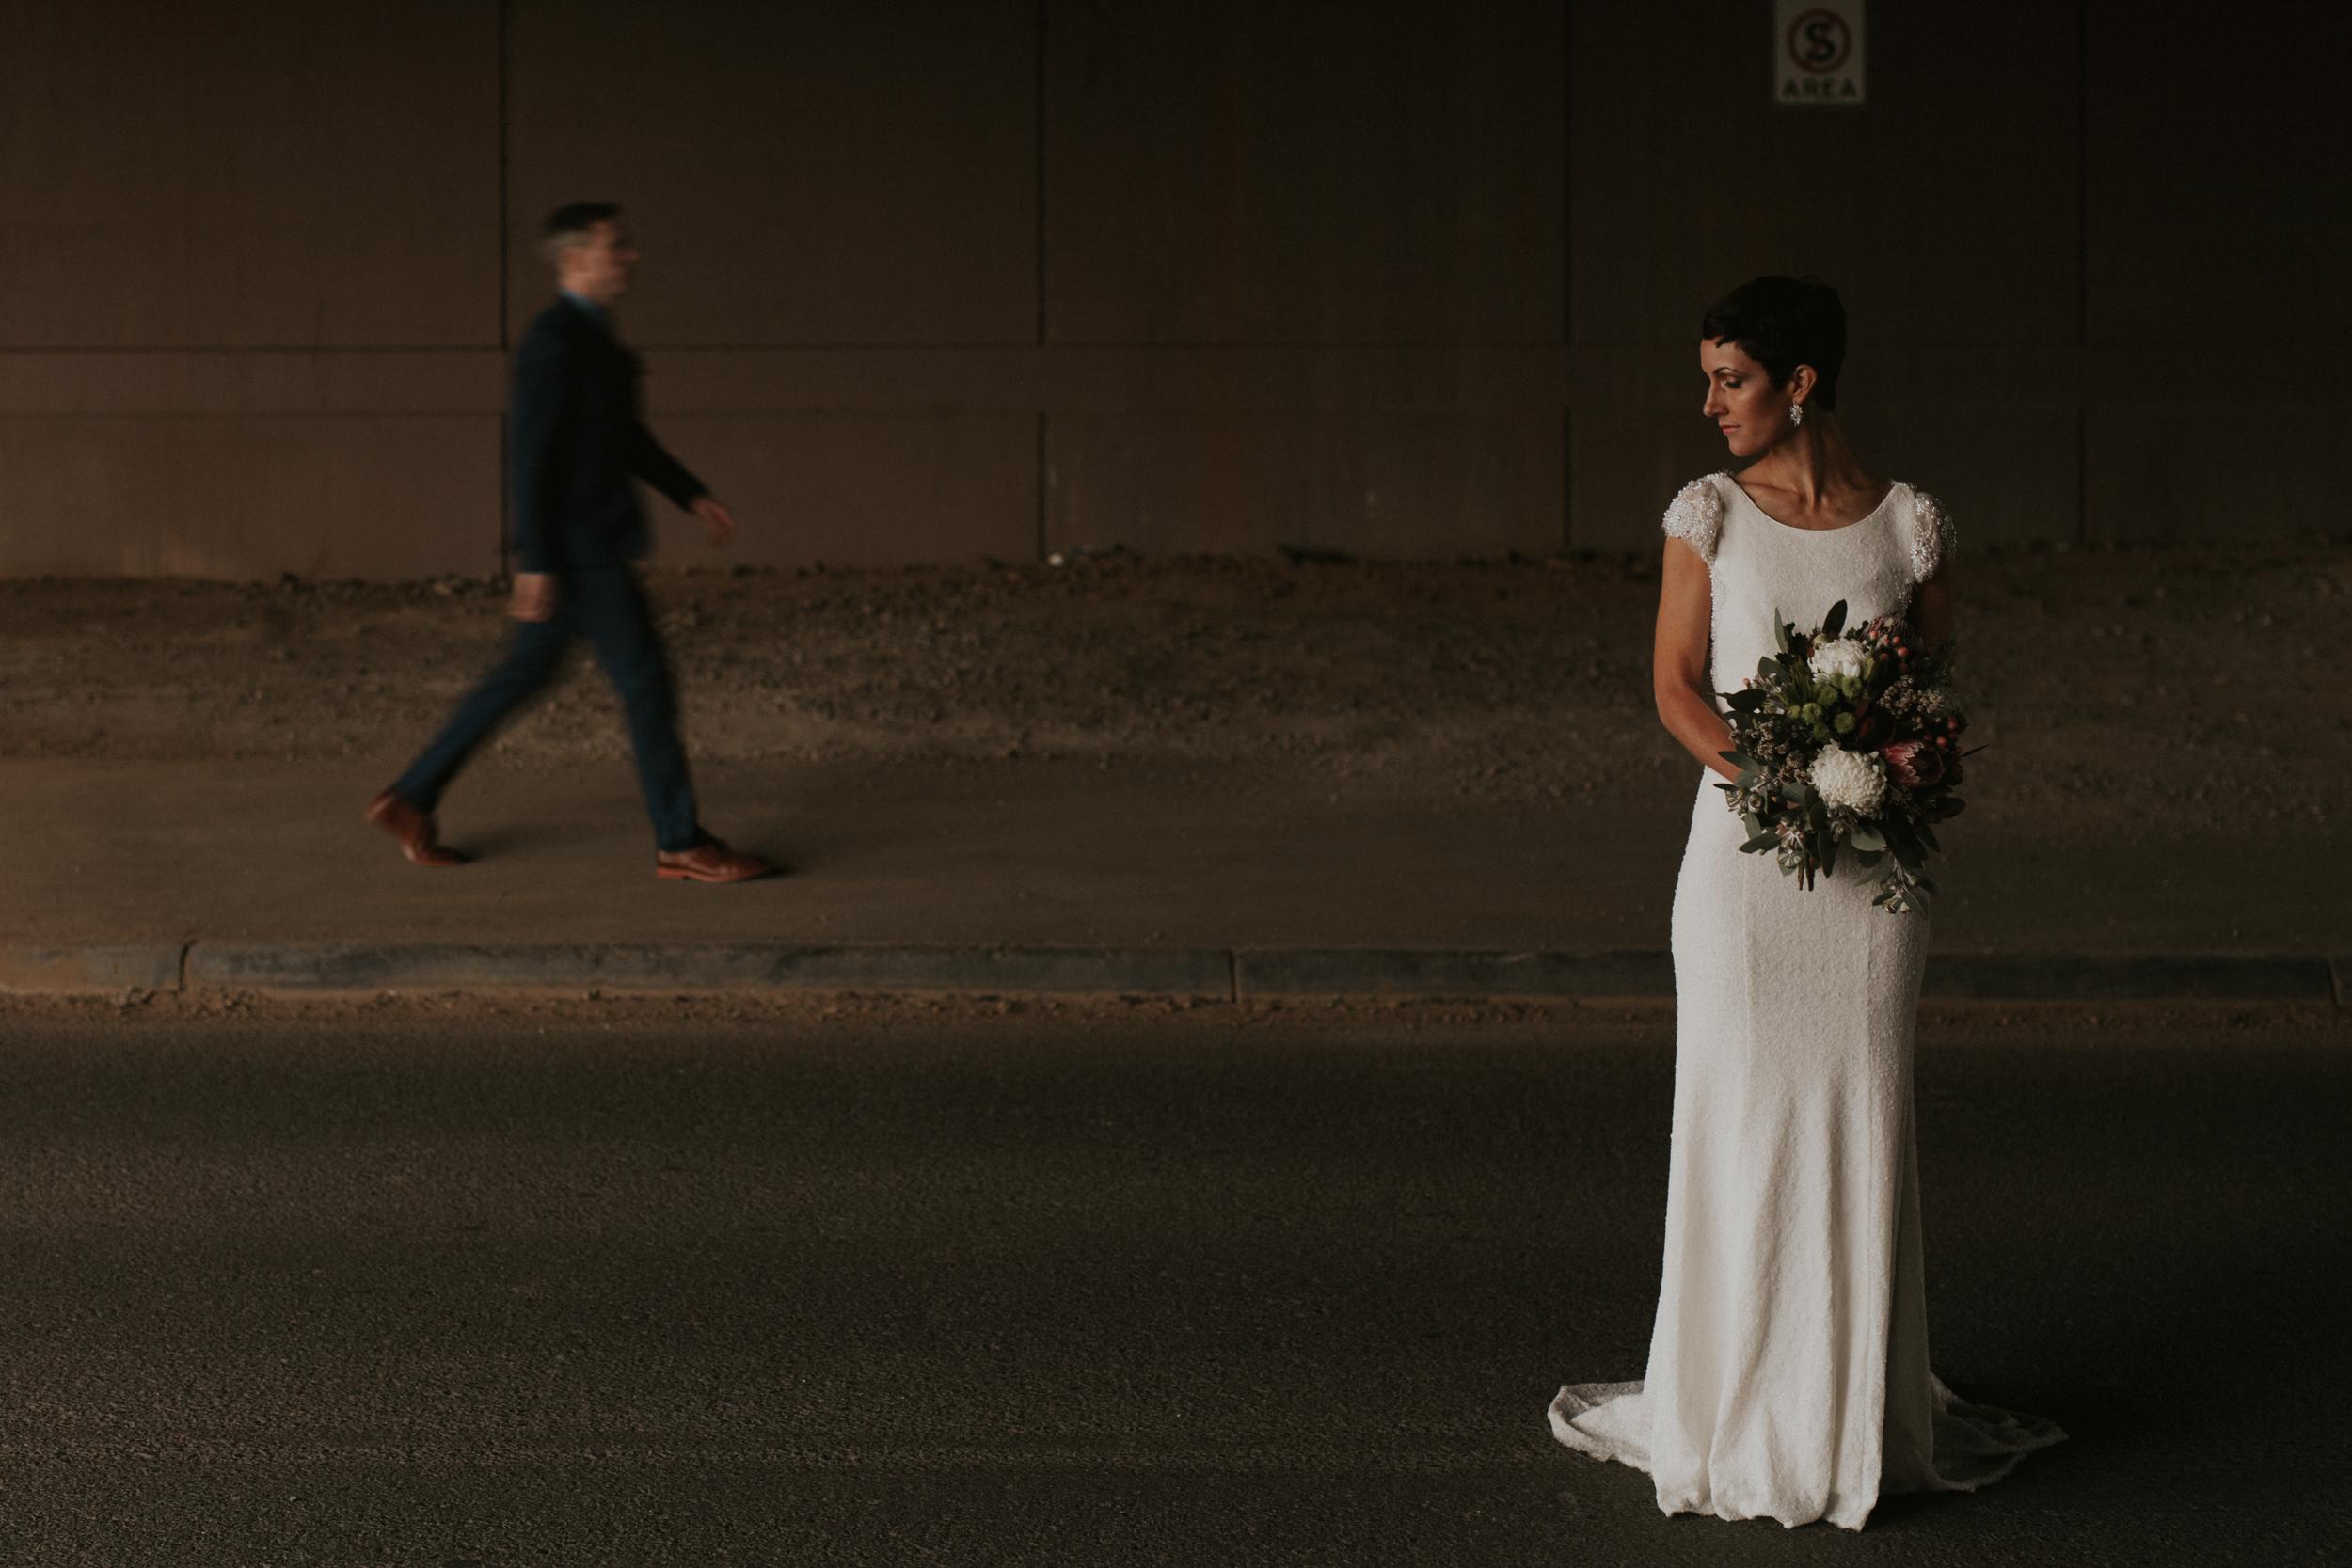 Melbourne-city-wedding-emotionsandmath-058.jpg